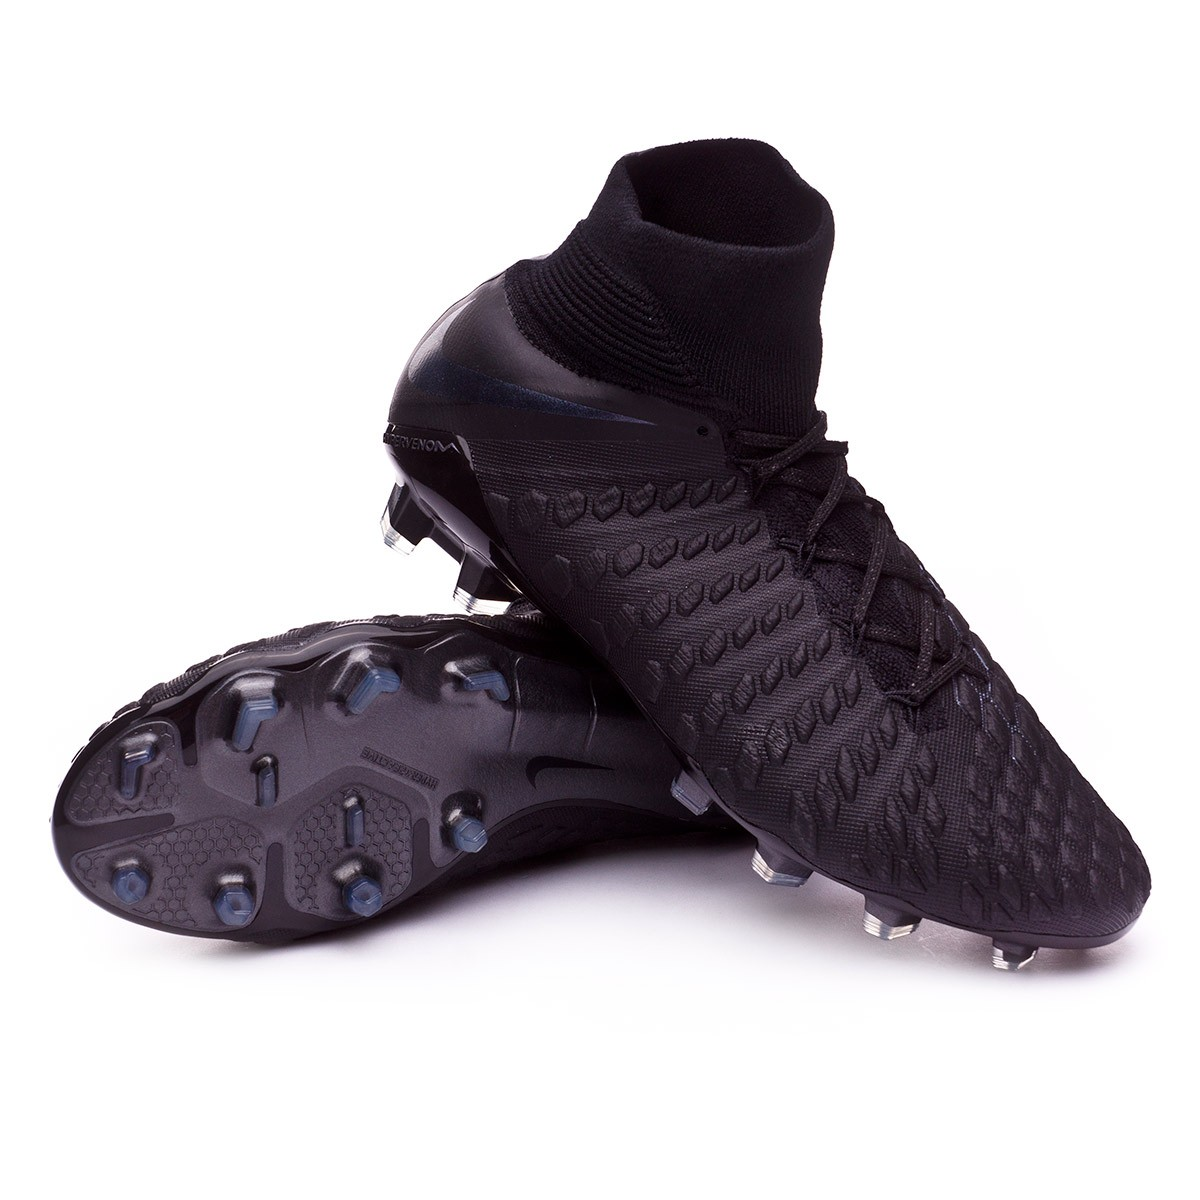 sports shoes 730bb 89977 Bota Hypervenom Phantom III Elite DF FG Black